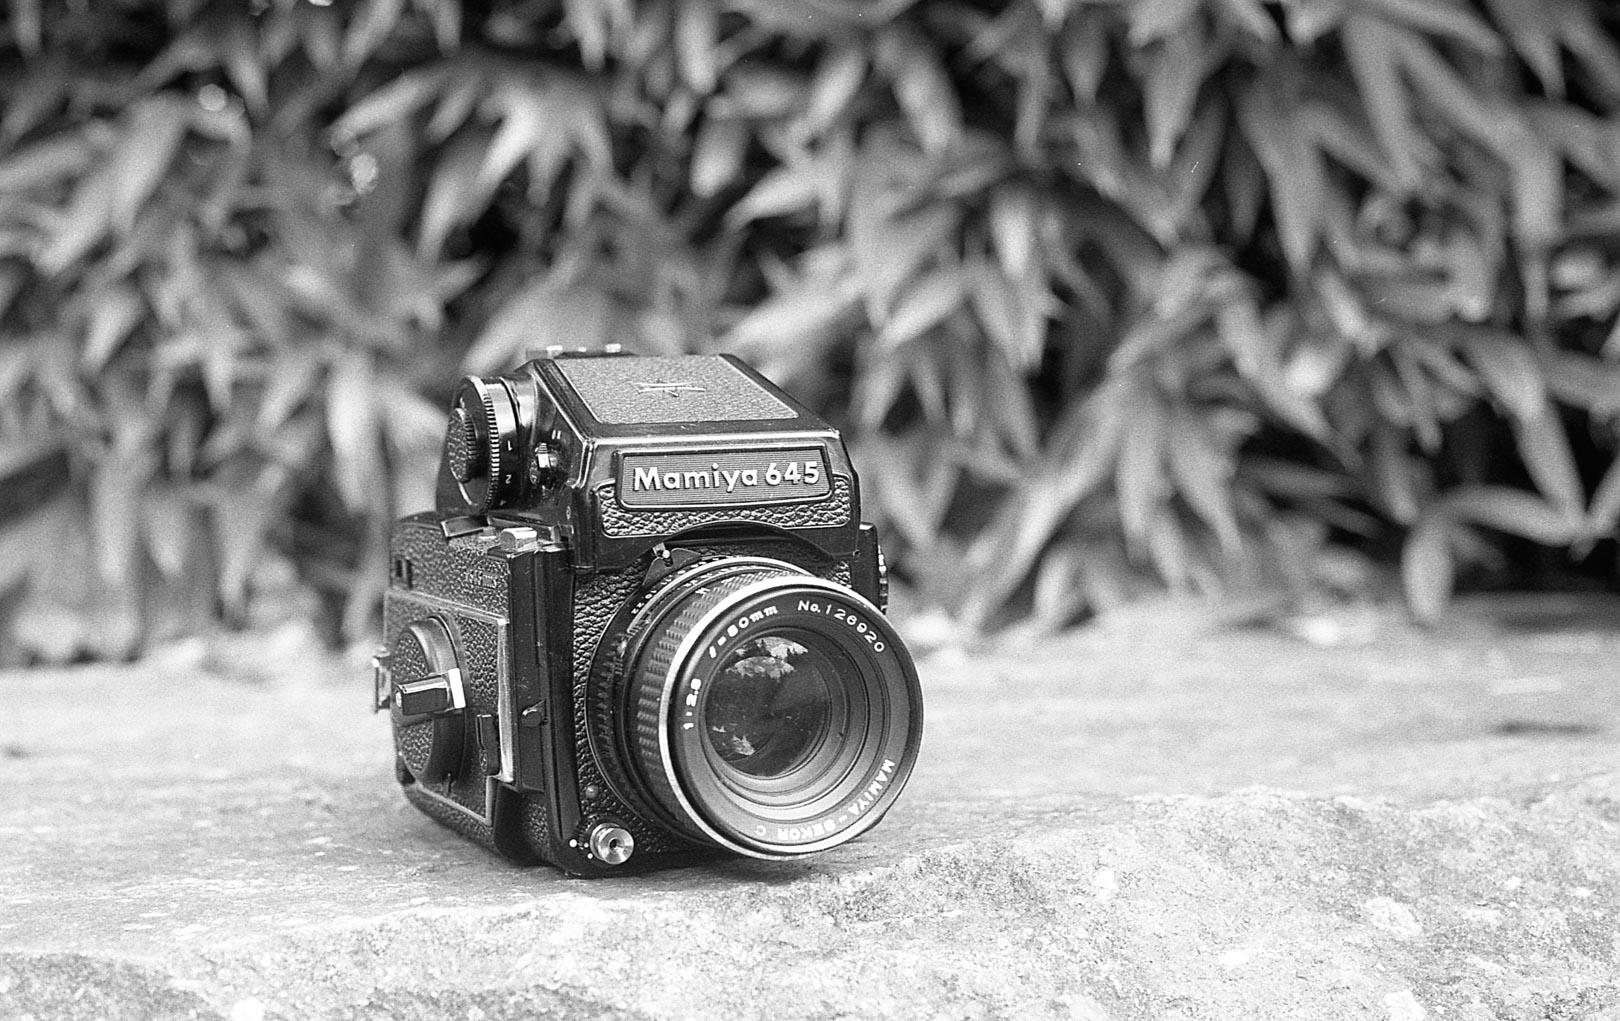 Photo prise avec la Tmax 400 (Kodak) - Scan brut Epson v600